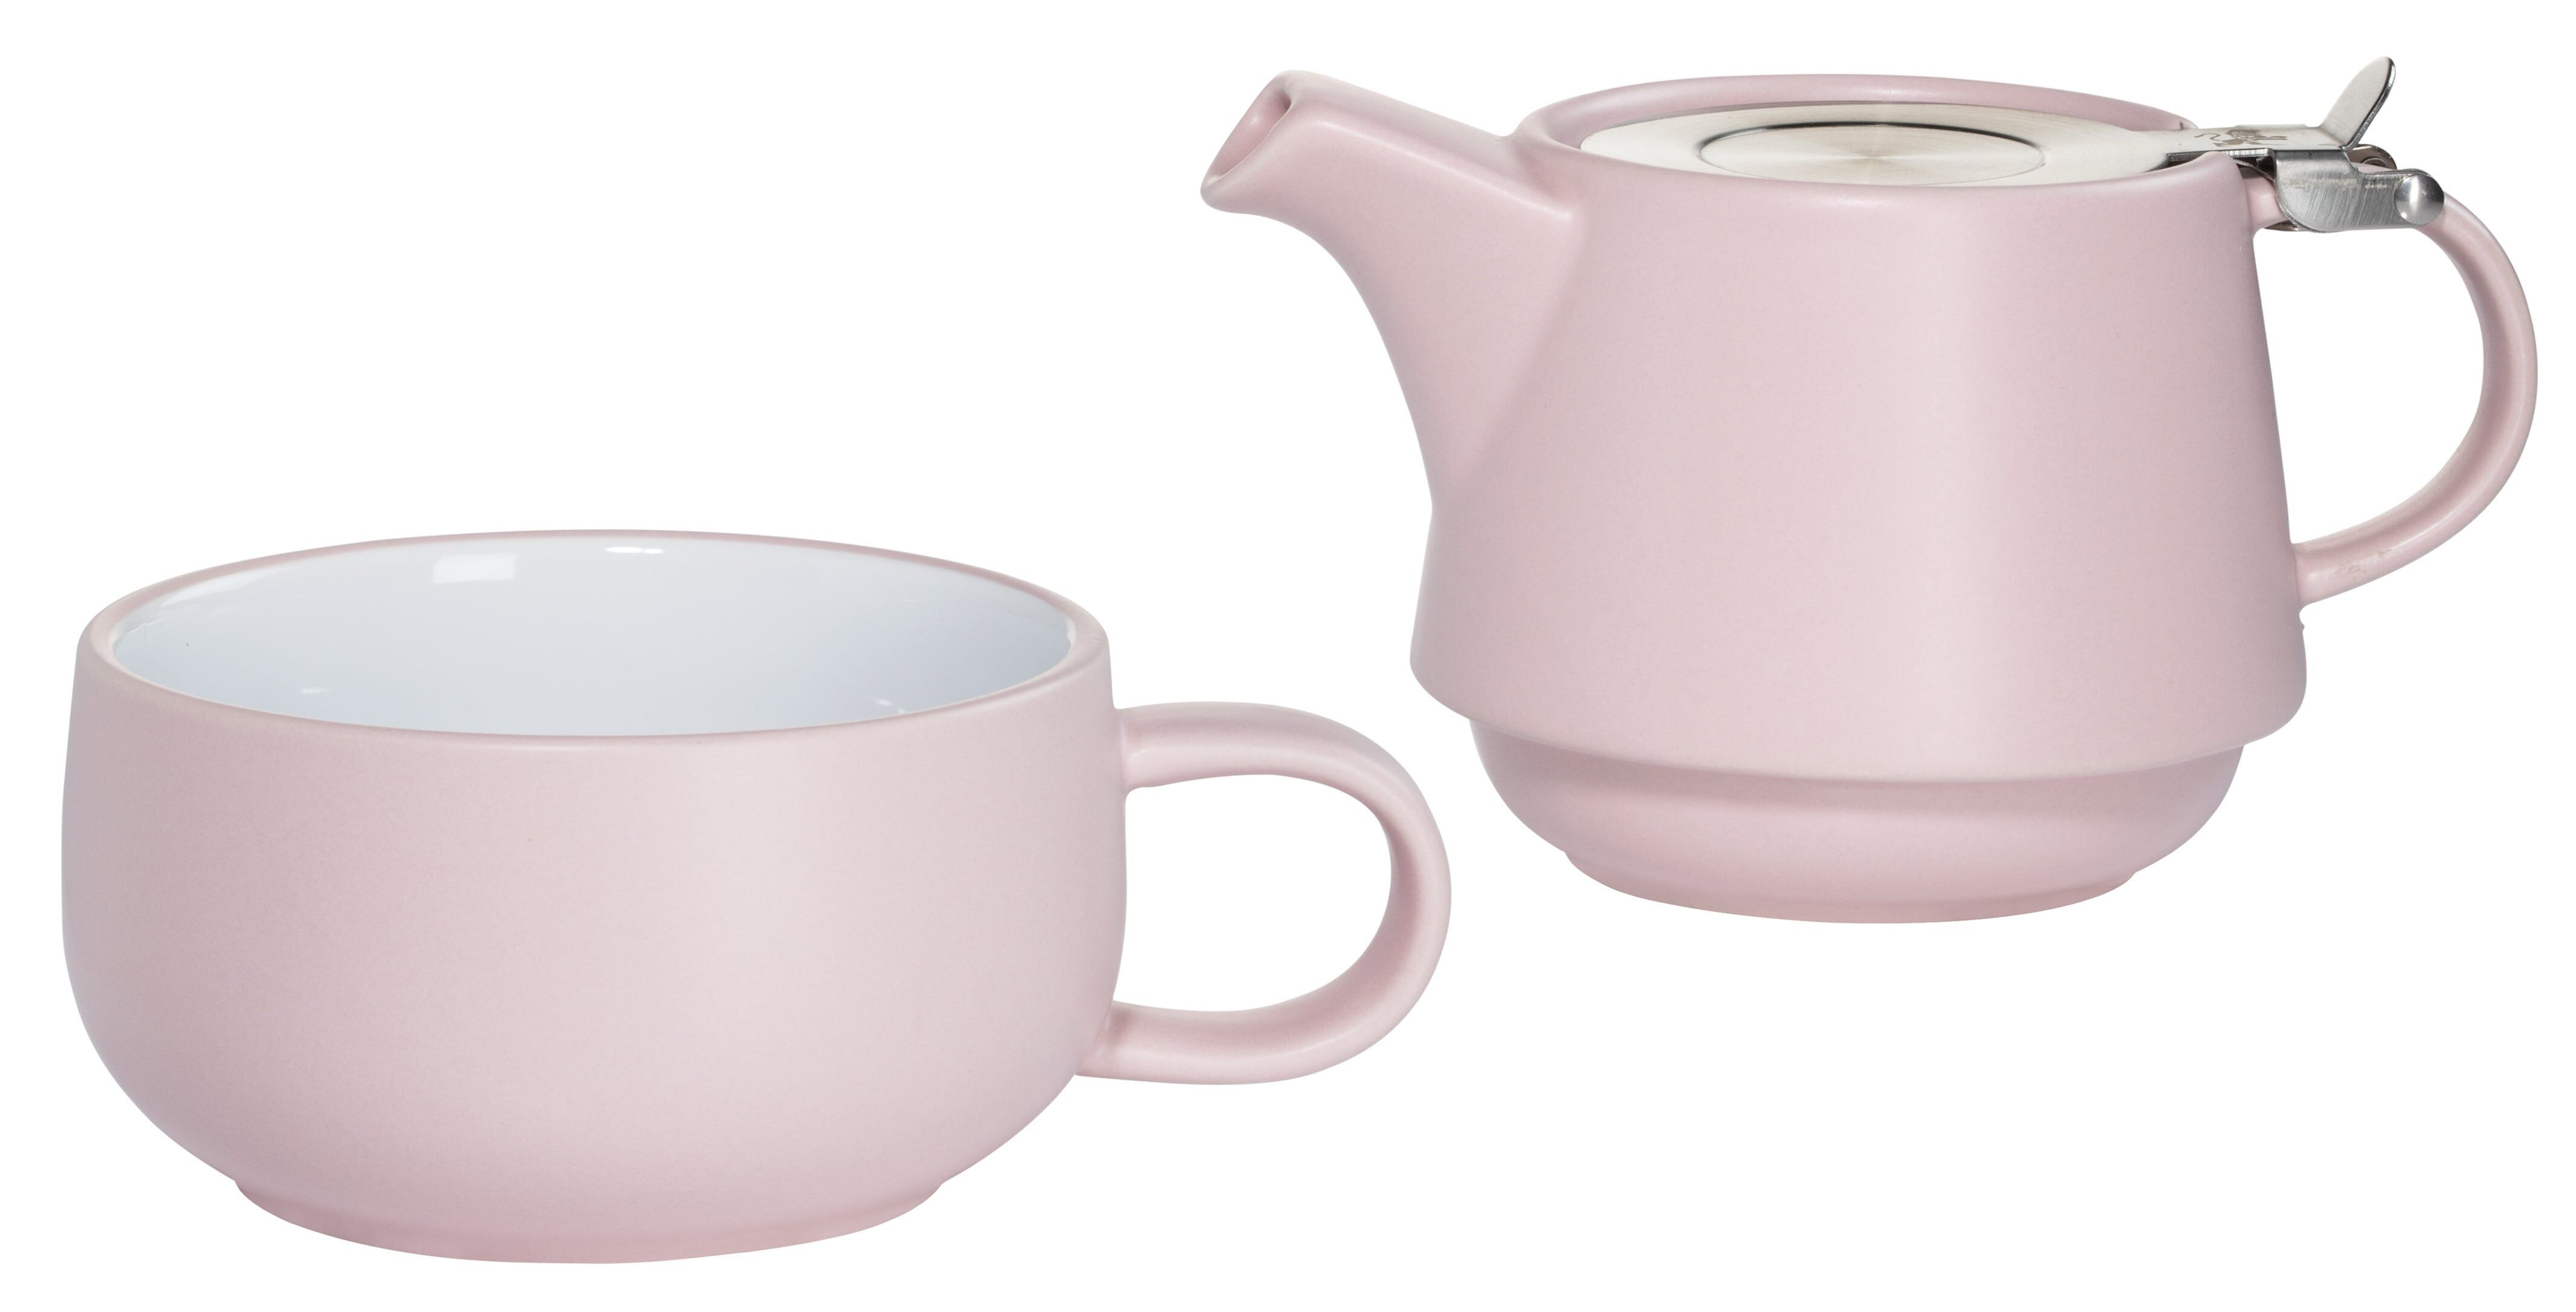 Roze.jpeg